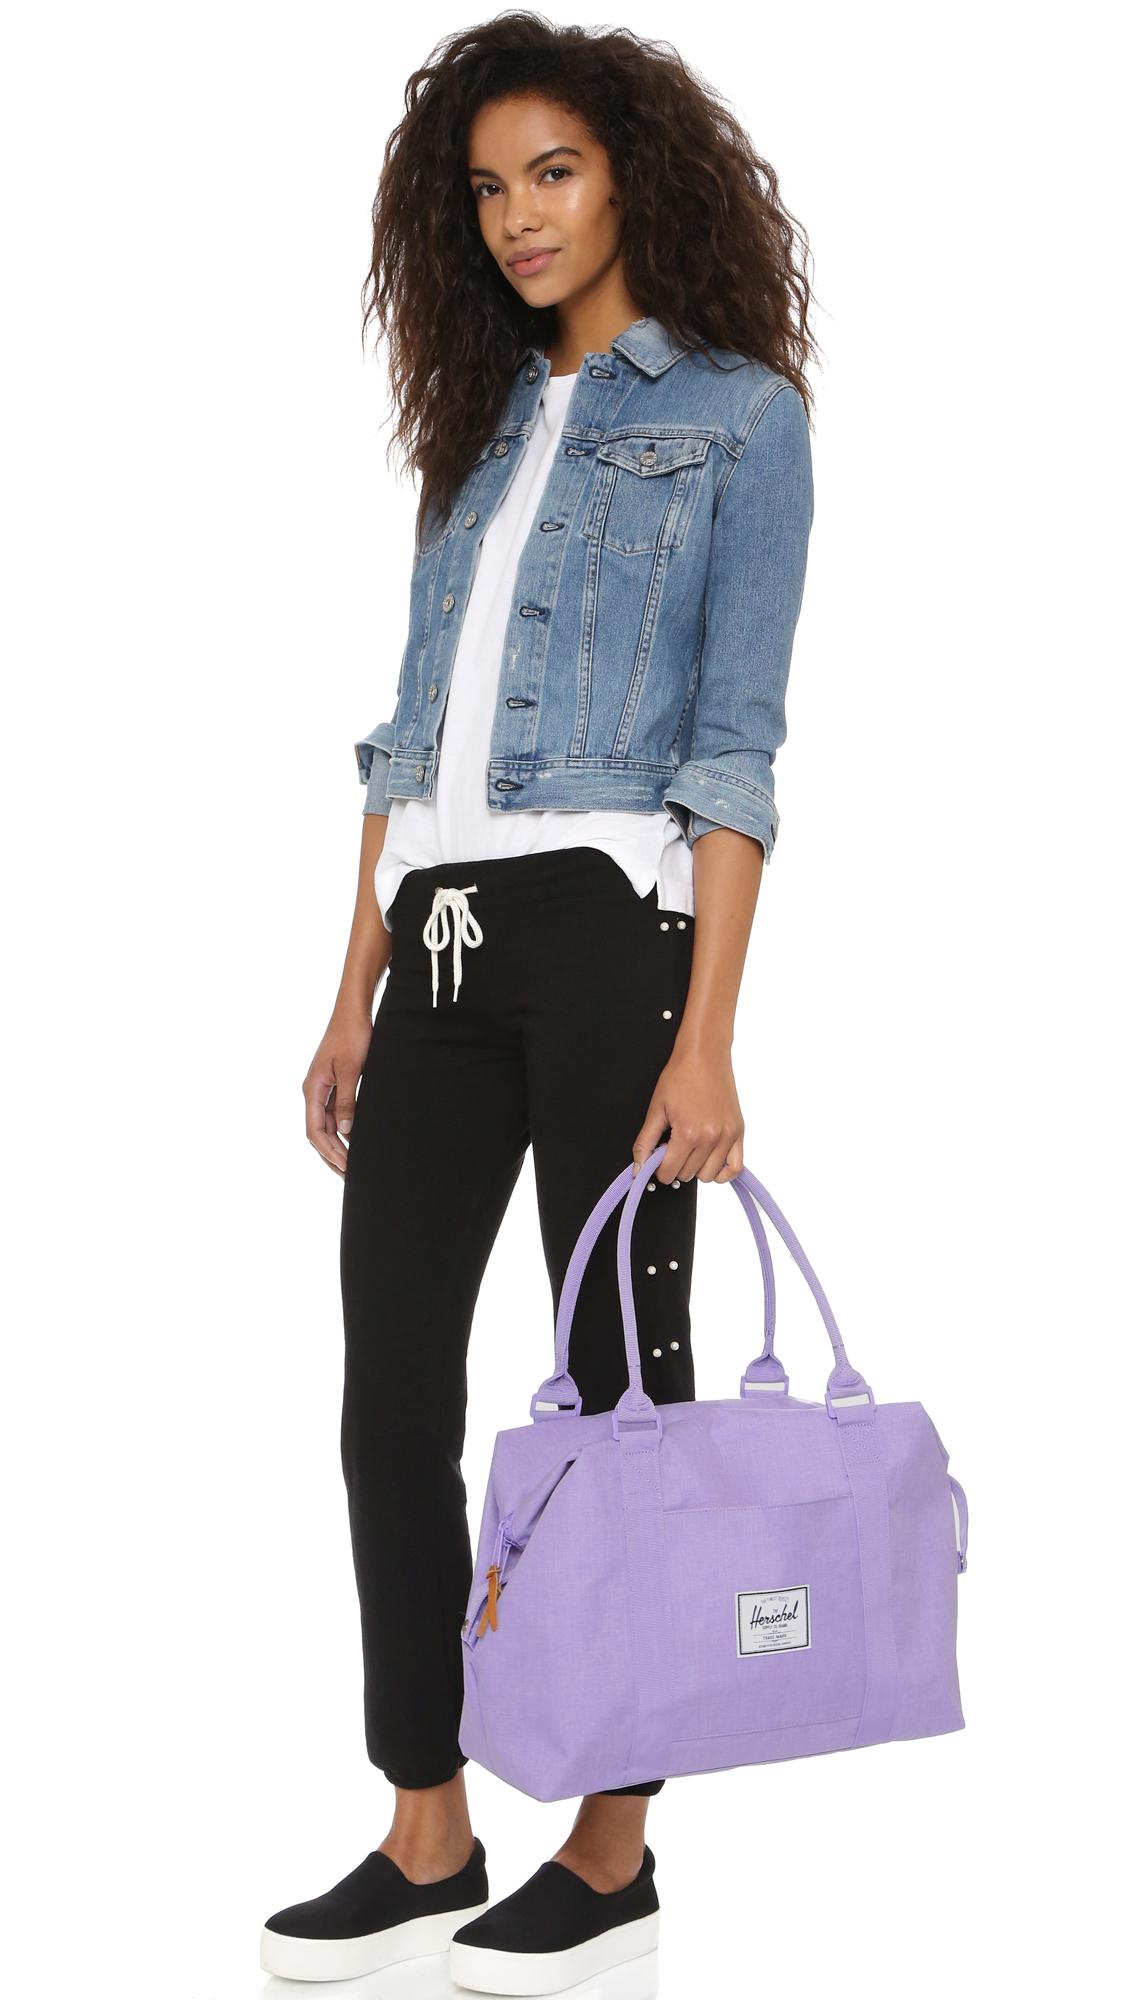 715c9013a2 Lyst - Herschel Supply Co. Strand Duffel Bag - Lilac in Purple